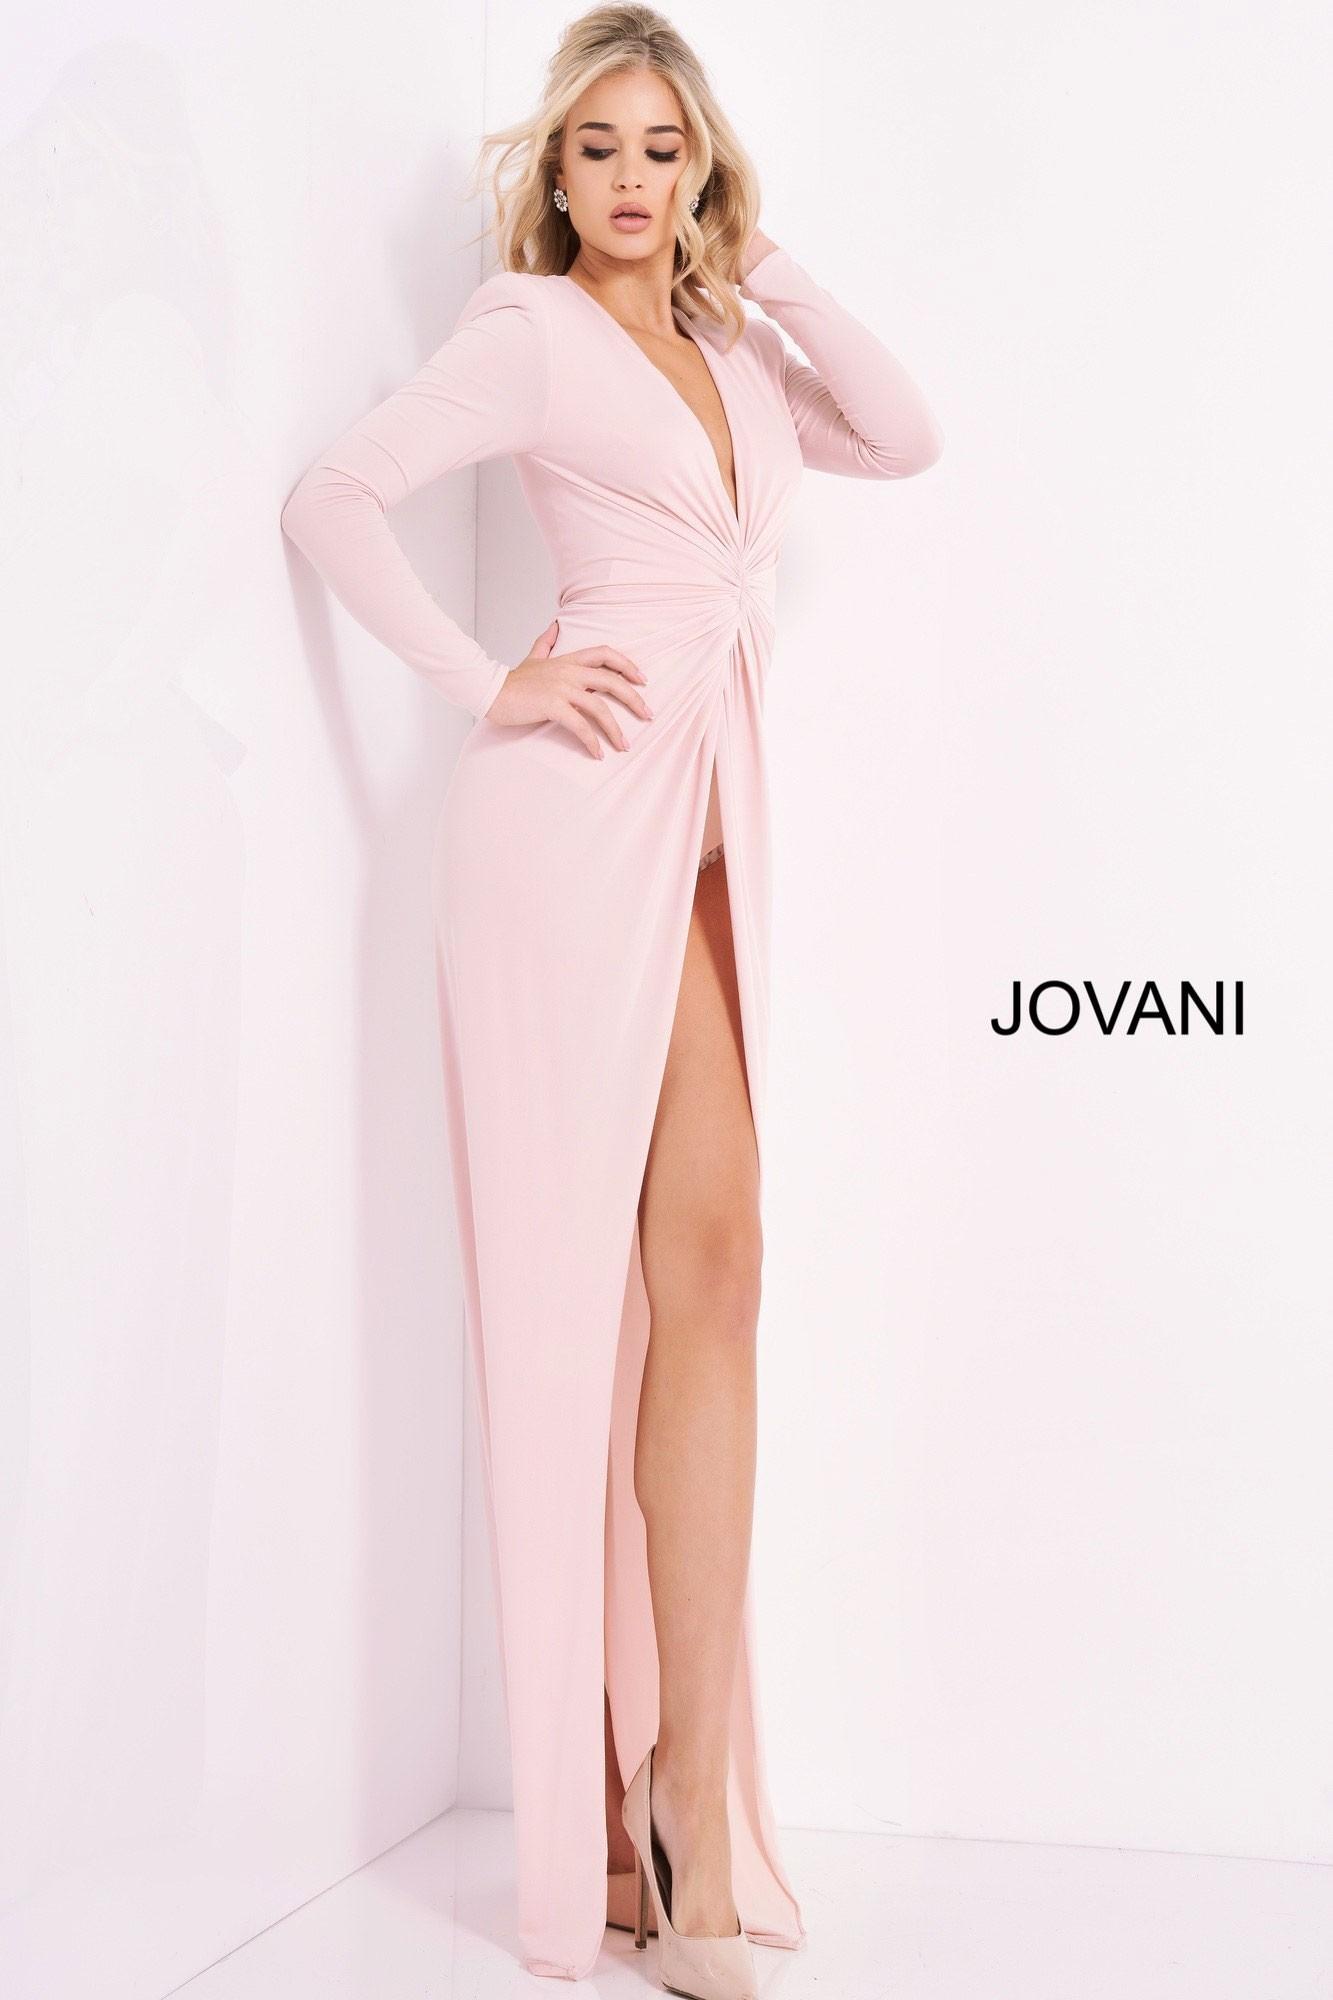 Jovani 3060